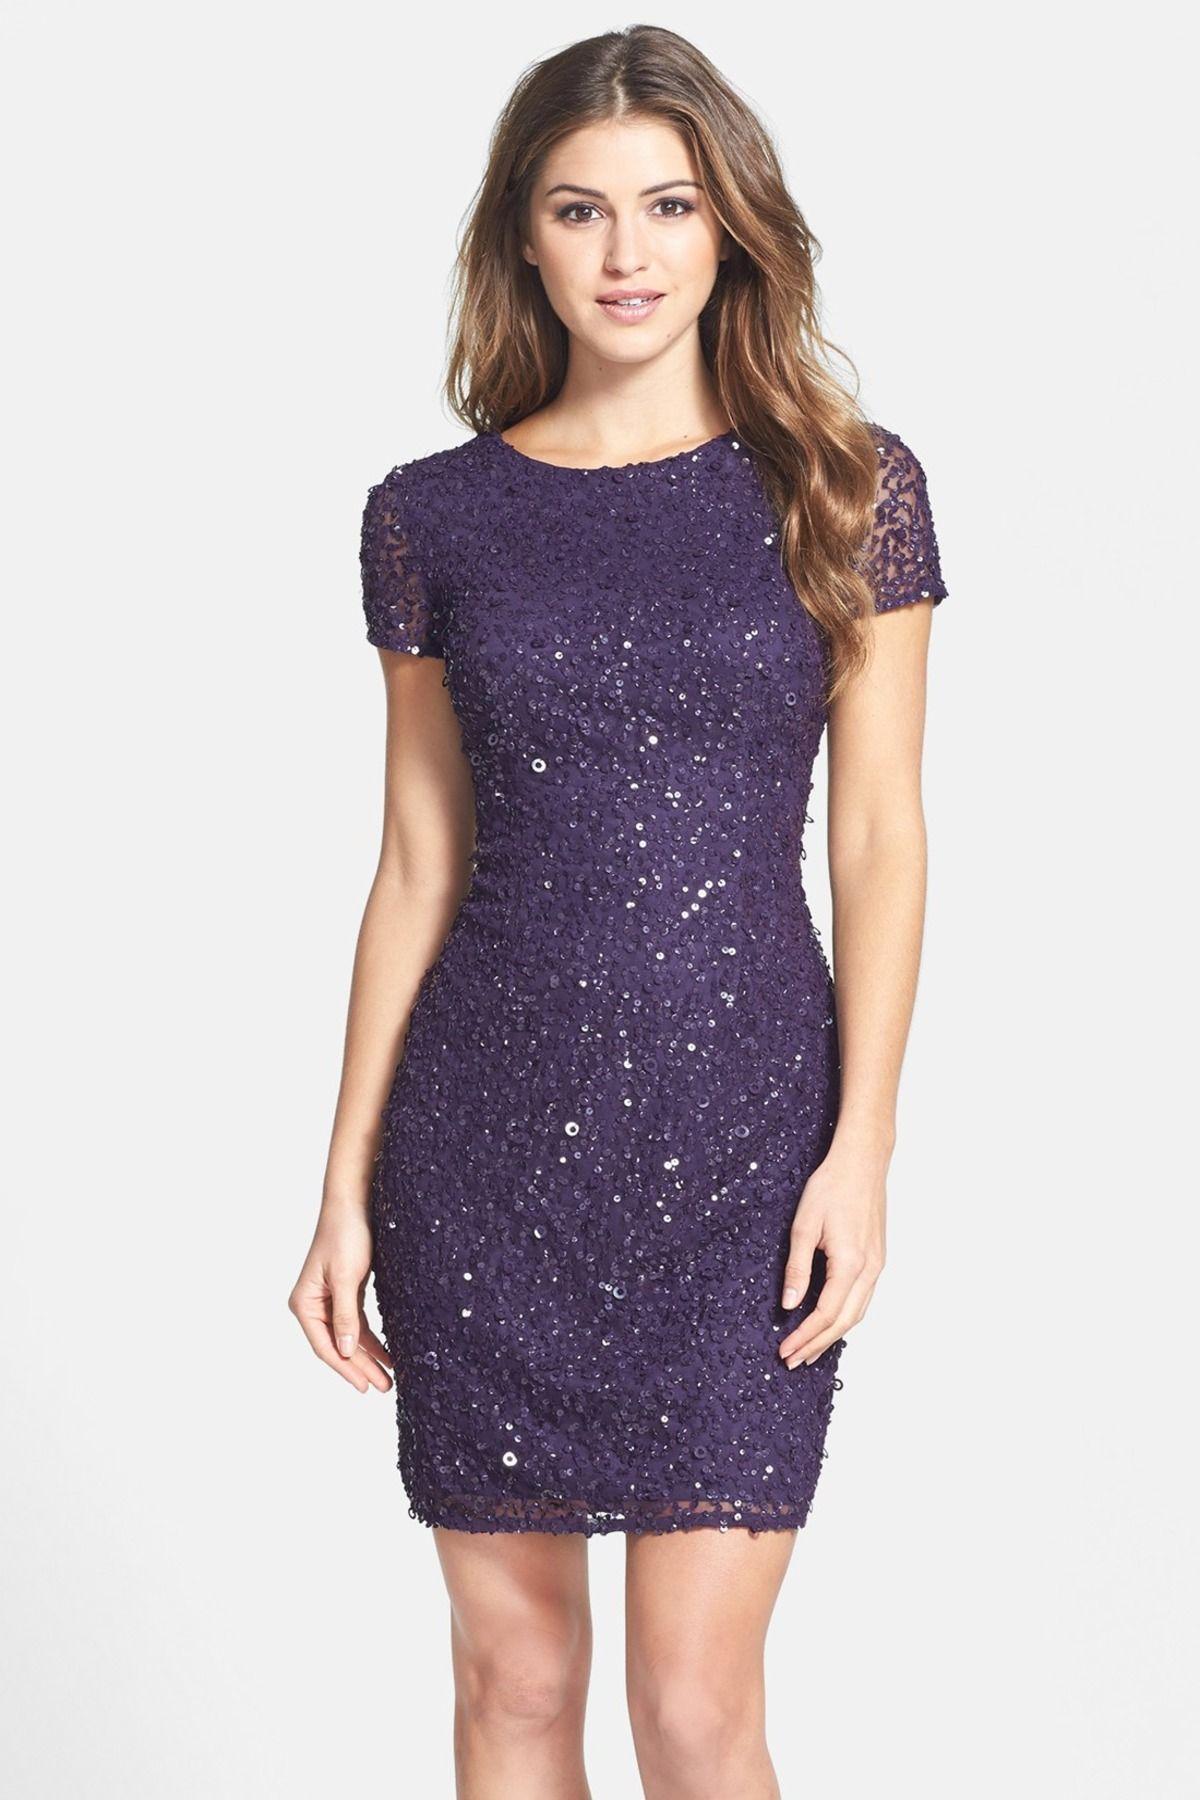 Adrianna Papell | Sequin Mesh Sheath Dress | Ropa linda, Púrpura y ...